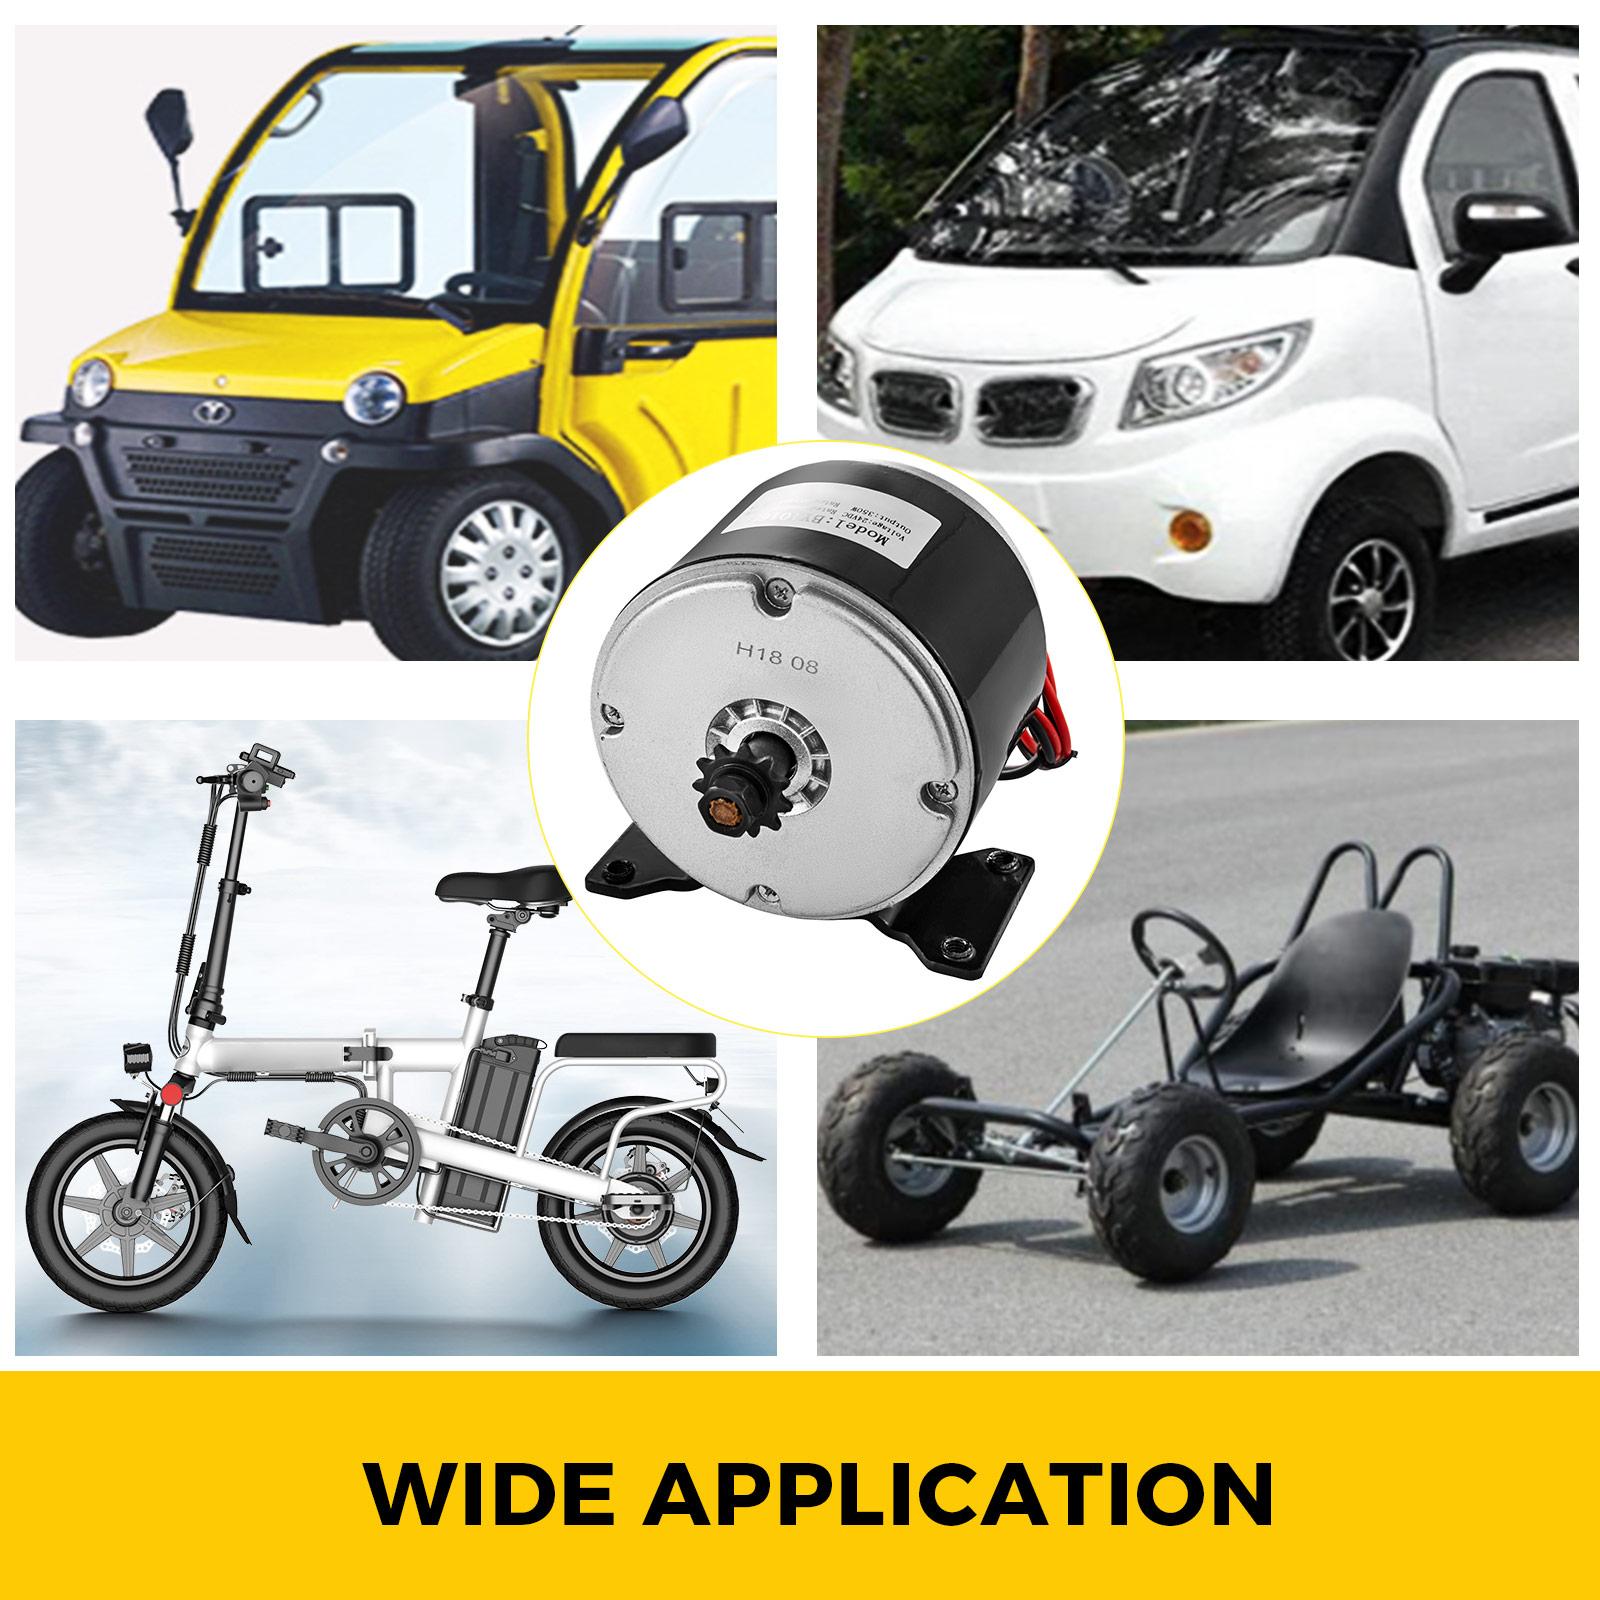 DC-electric-motor-12-60V-150W-2KW-for-scooter-bike-go-kart-minibike-e-ATV thumbnail 31